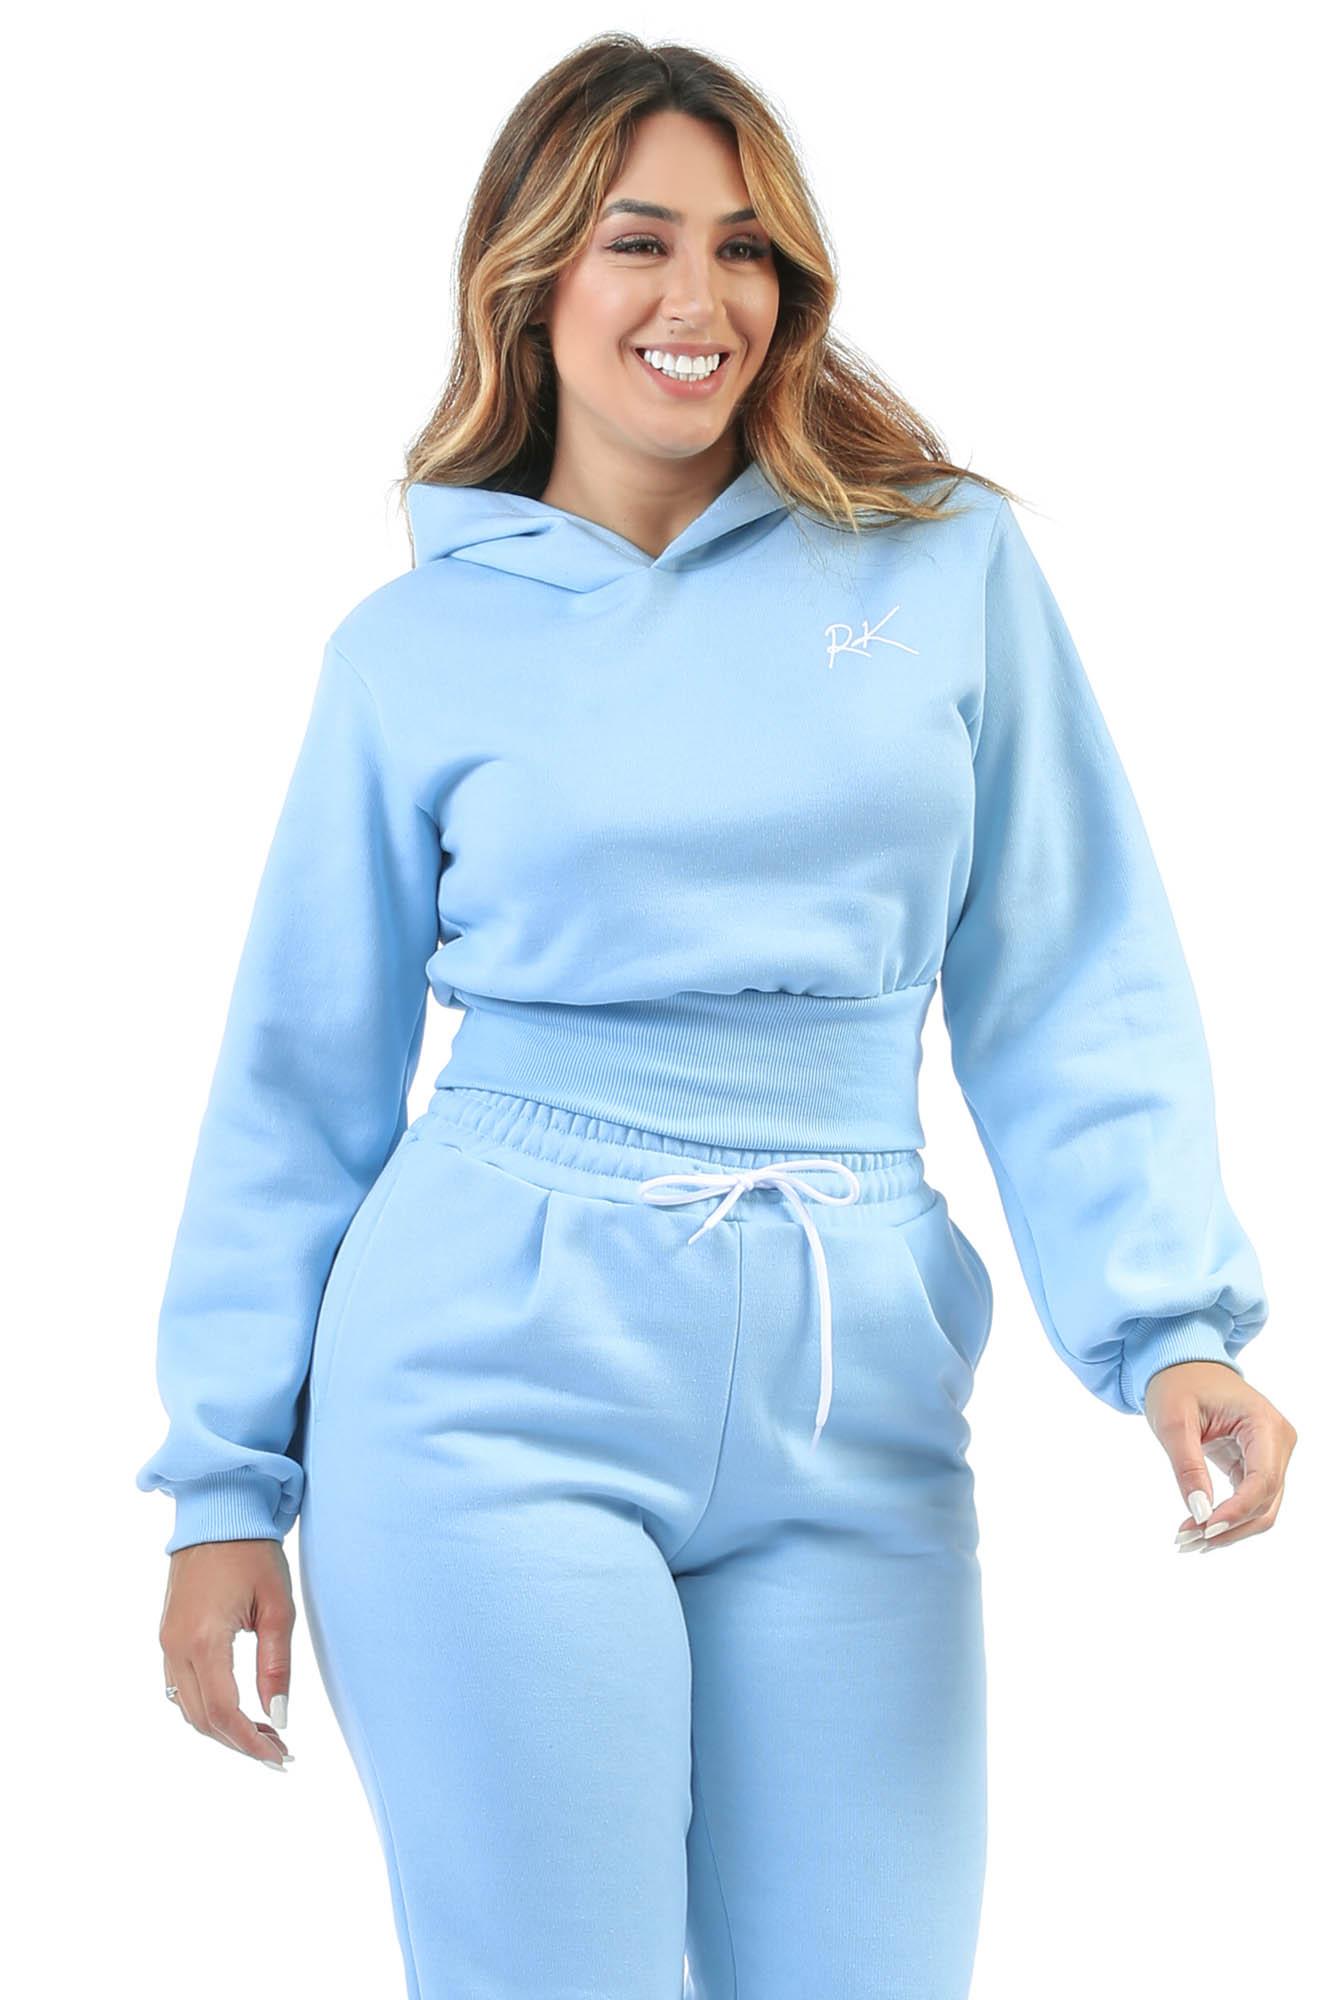 Blusa Moletom Baddie Baby Azul